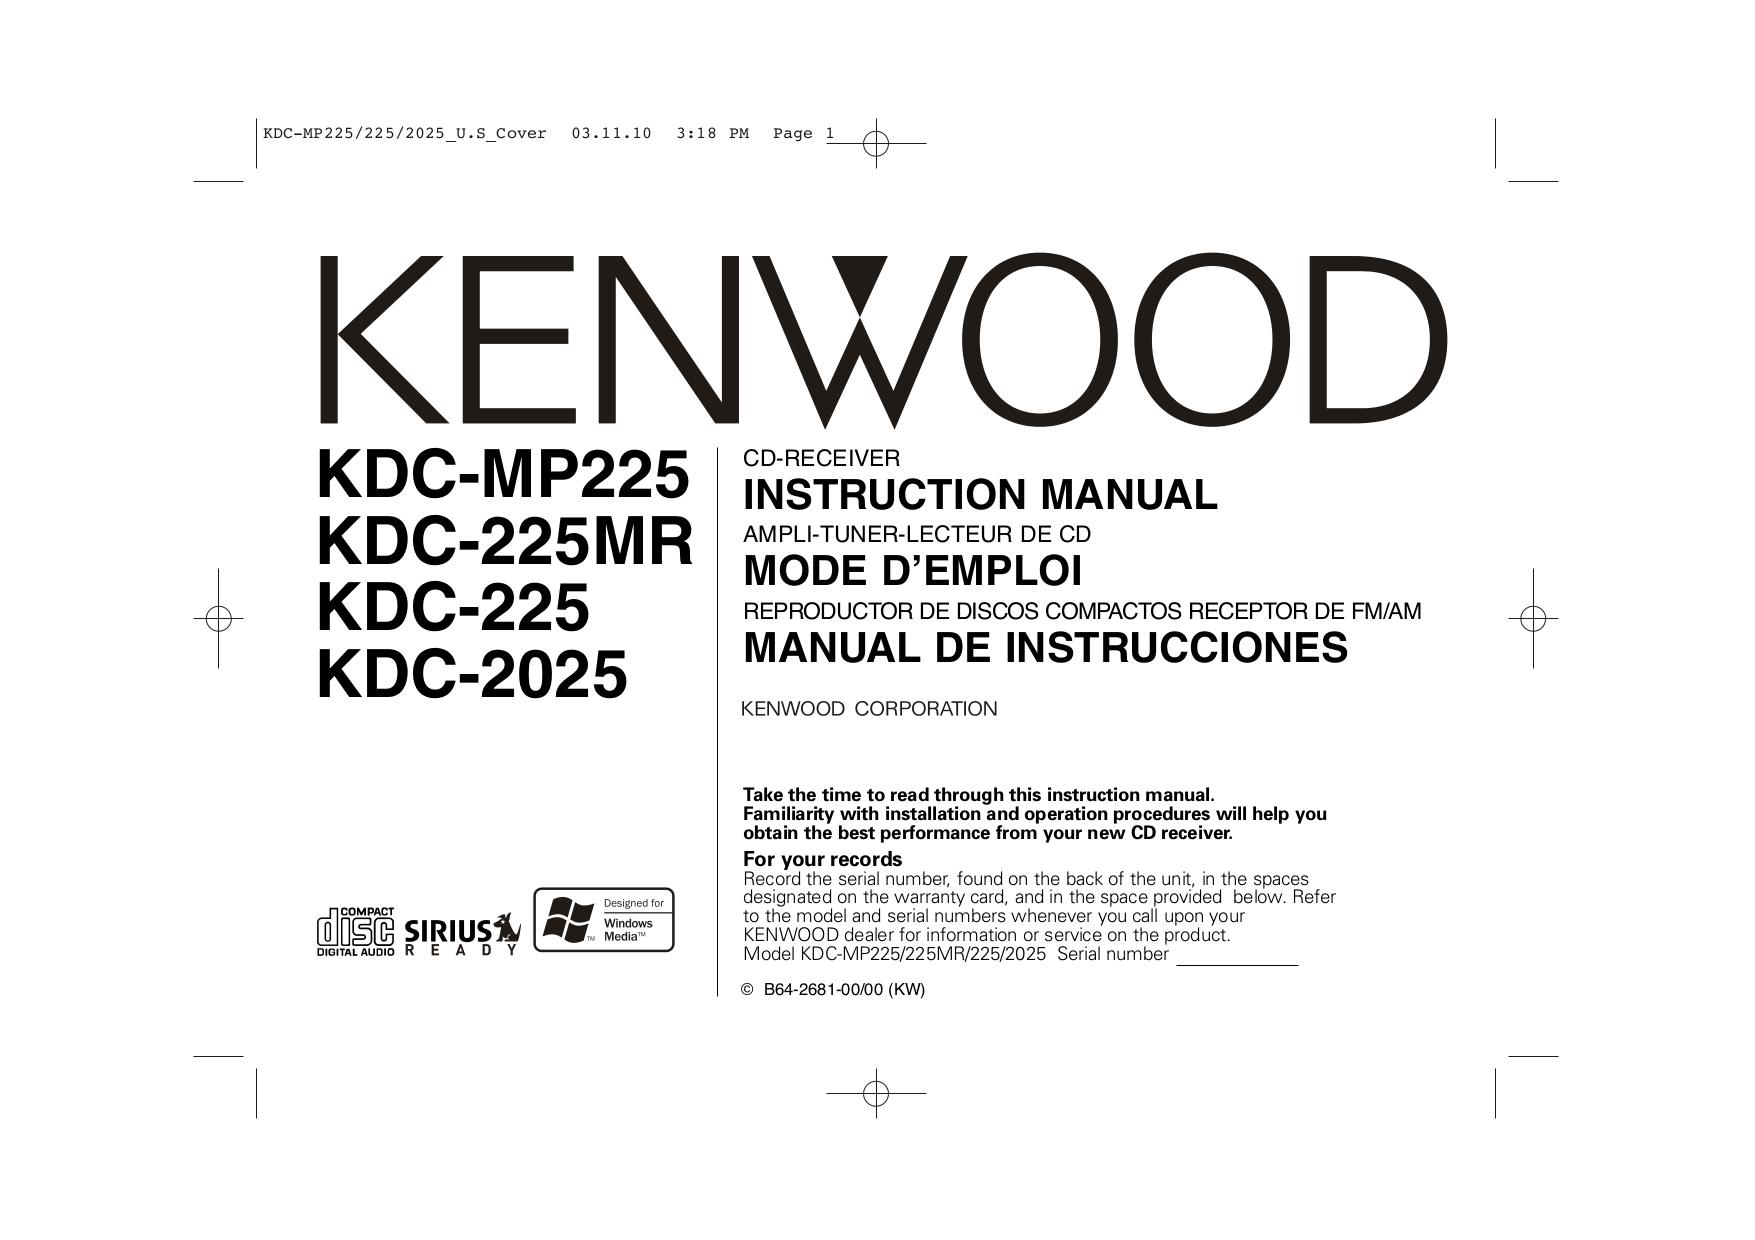 Kenwood Kdc Wiring Diagram Model on kenwood model kdc-352u, kenwood wiring external speaker, kenwood radios,